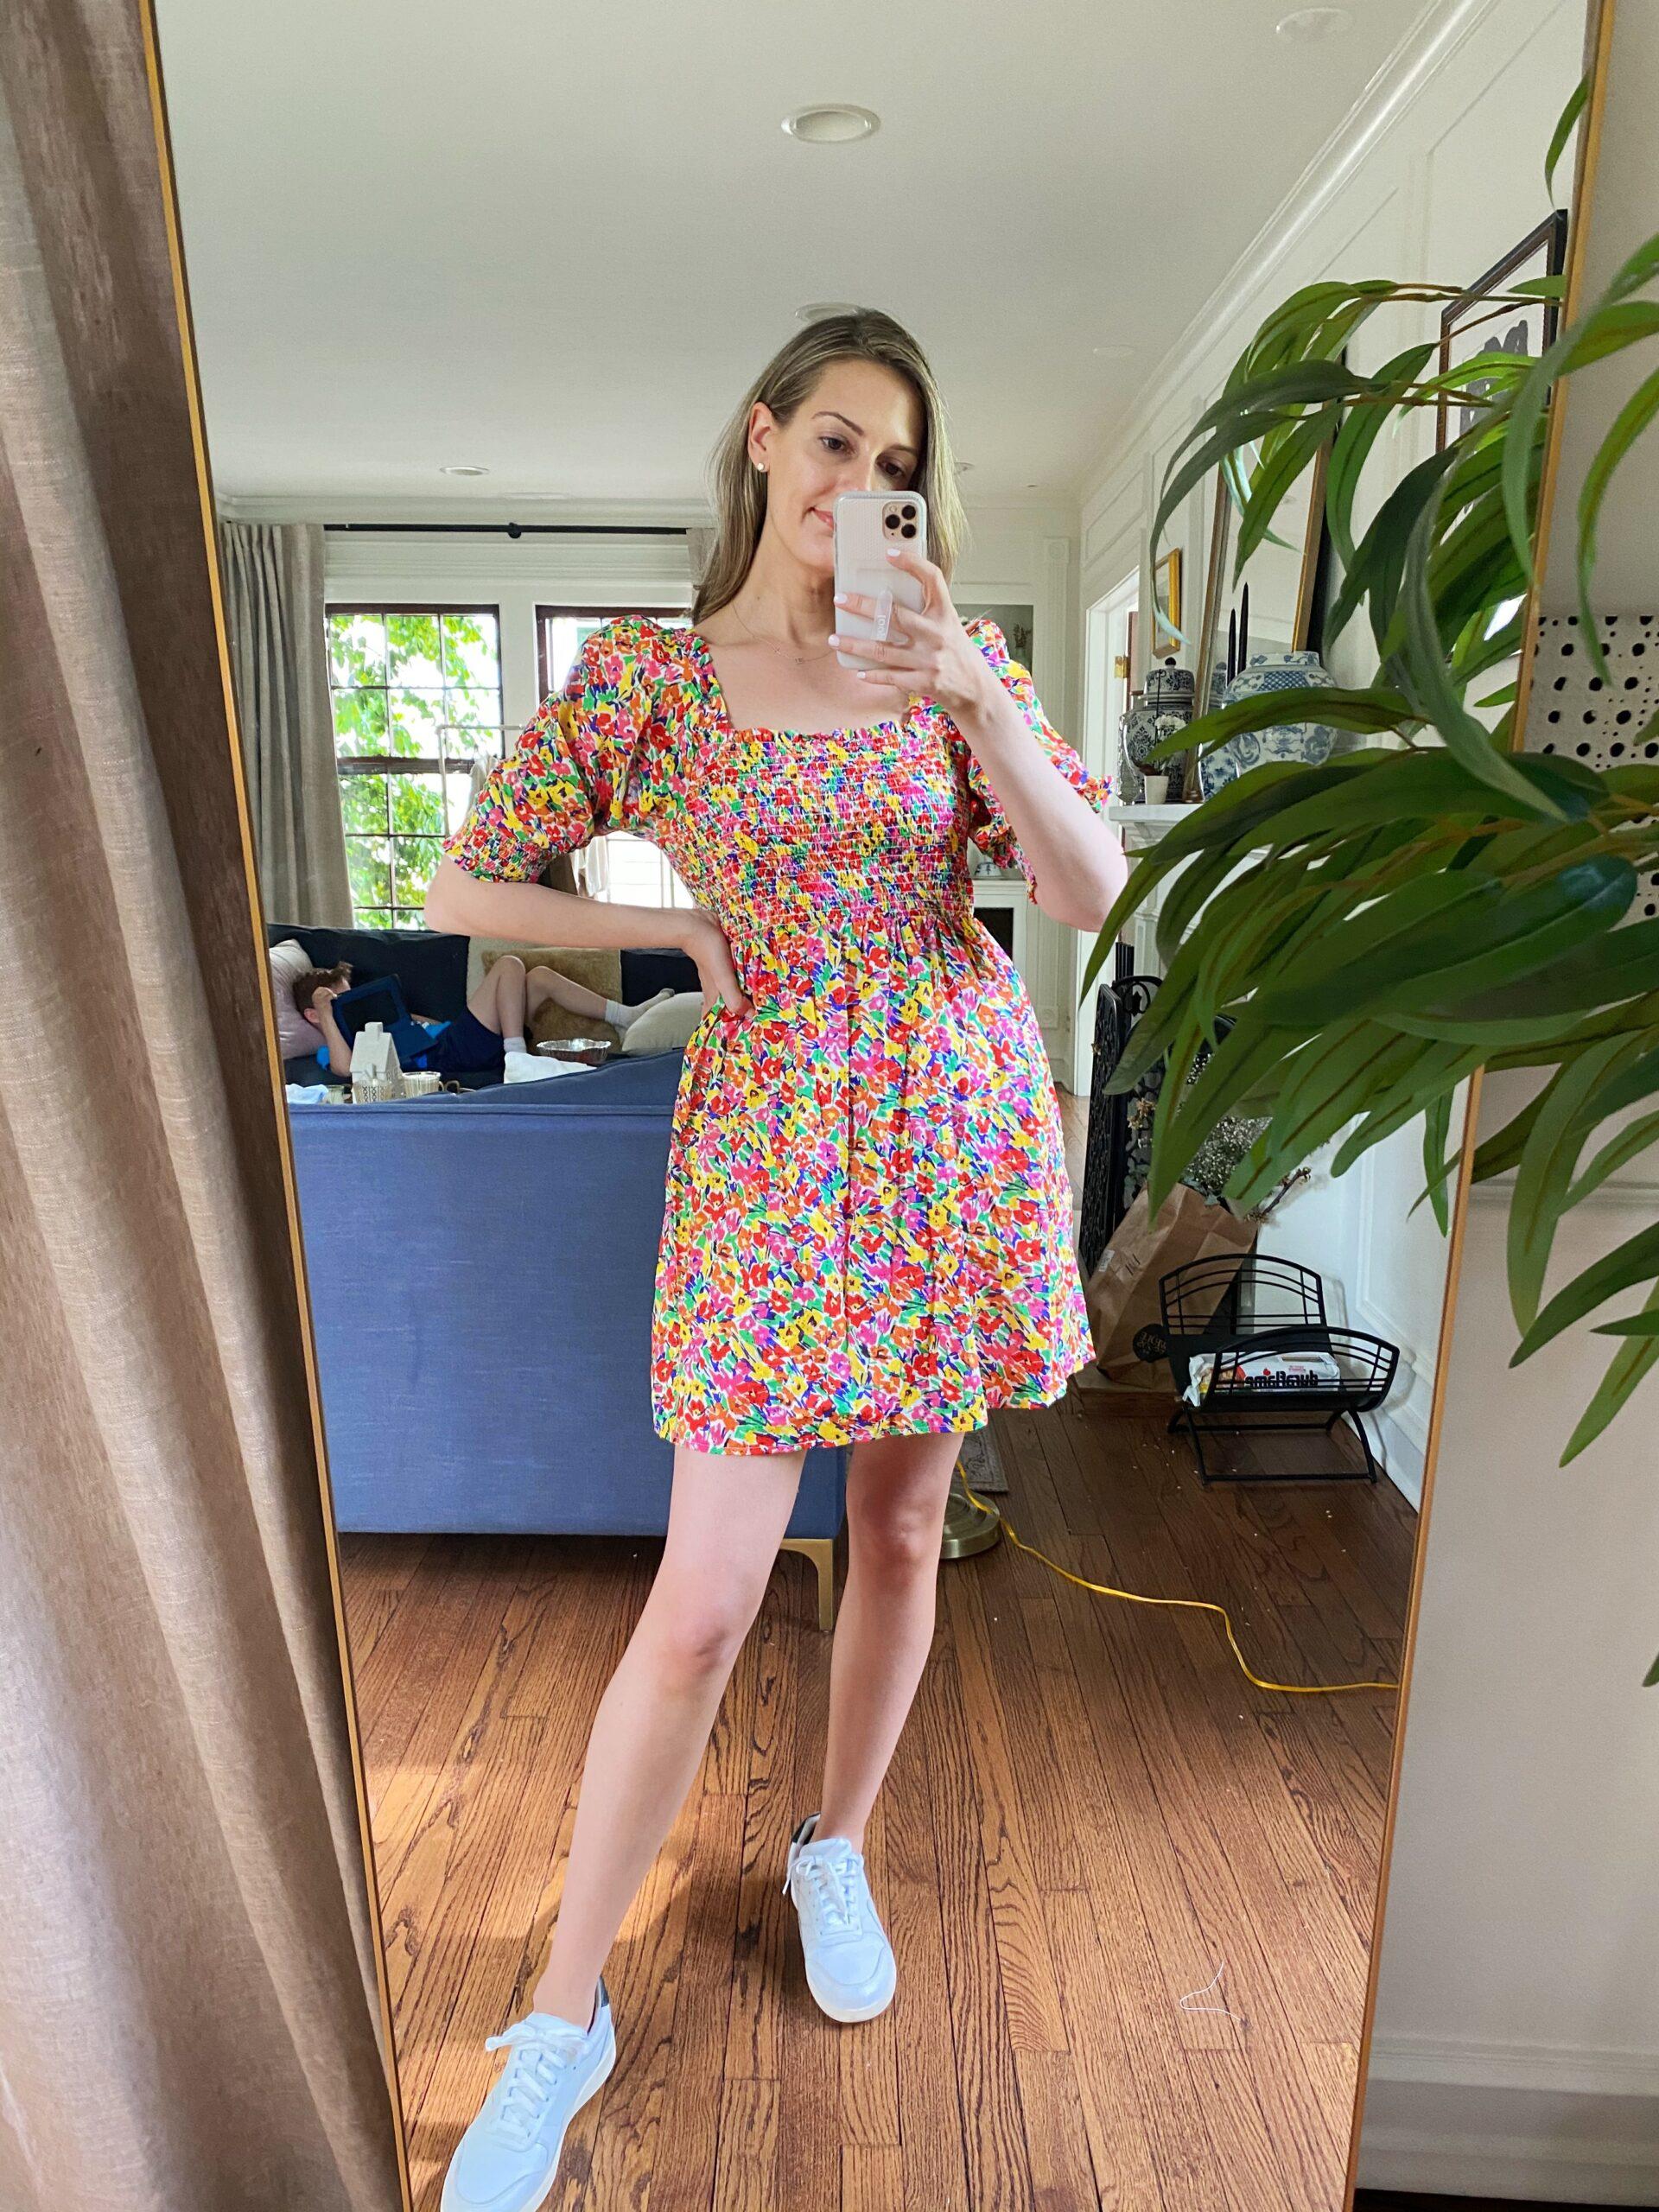 woman wearing floral dress by Target Rixo Dress